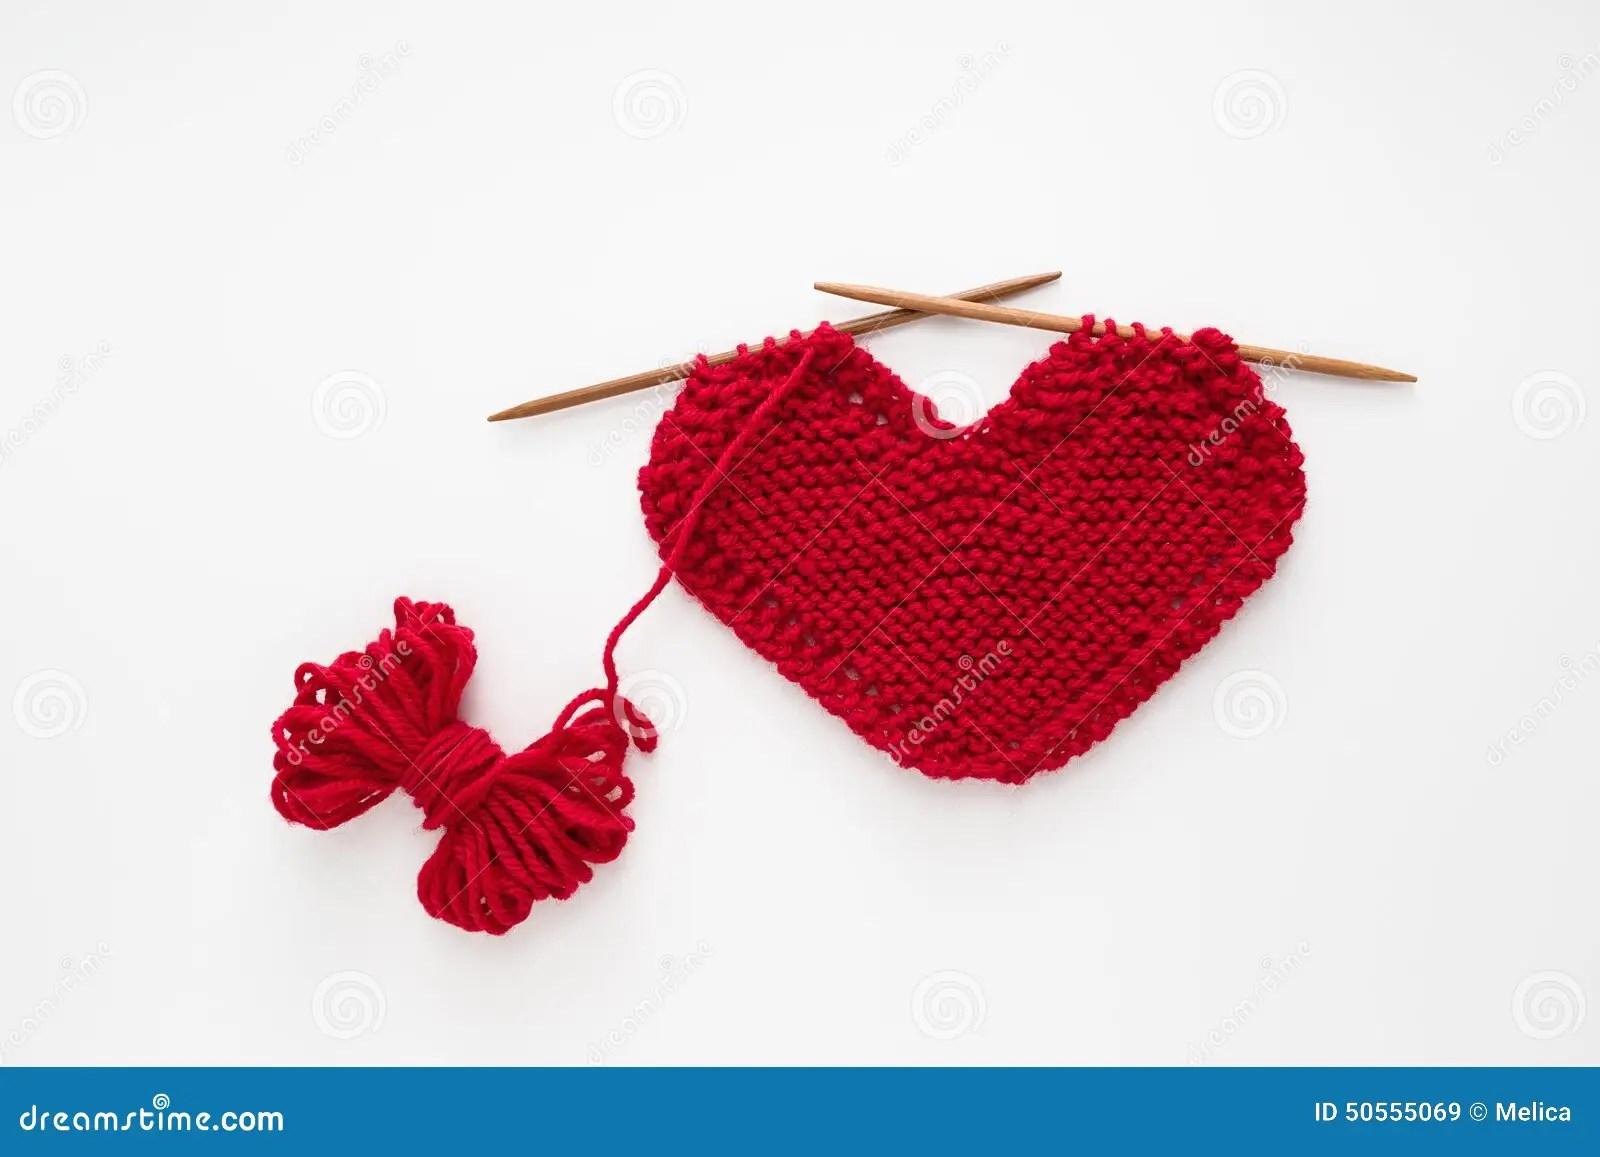 Love Knitting Stock Photo Image 50555069